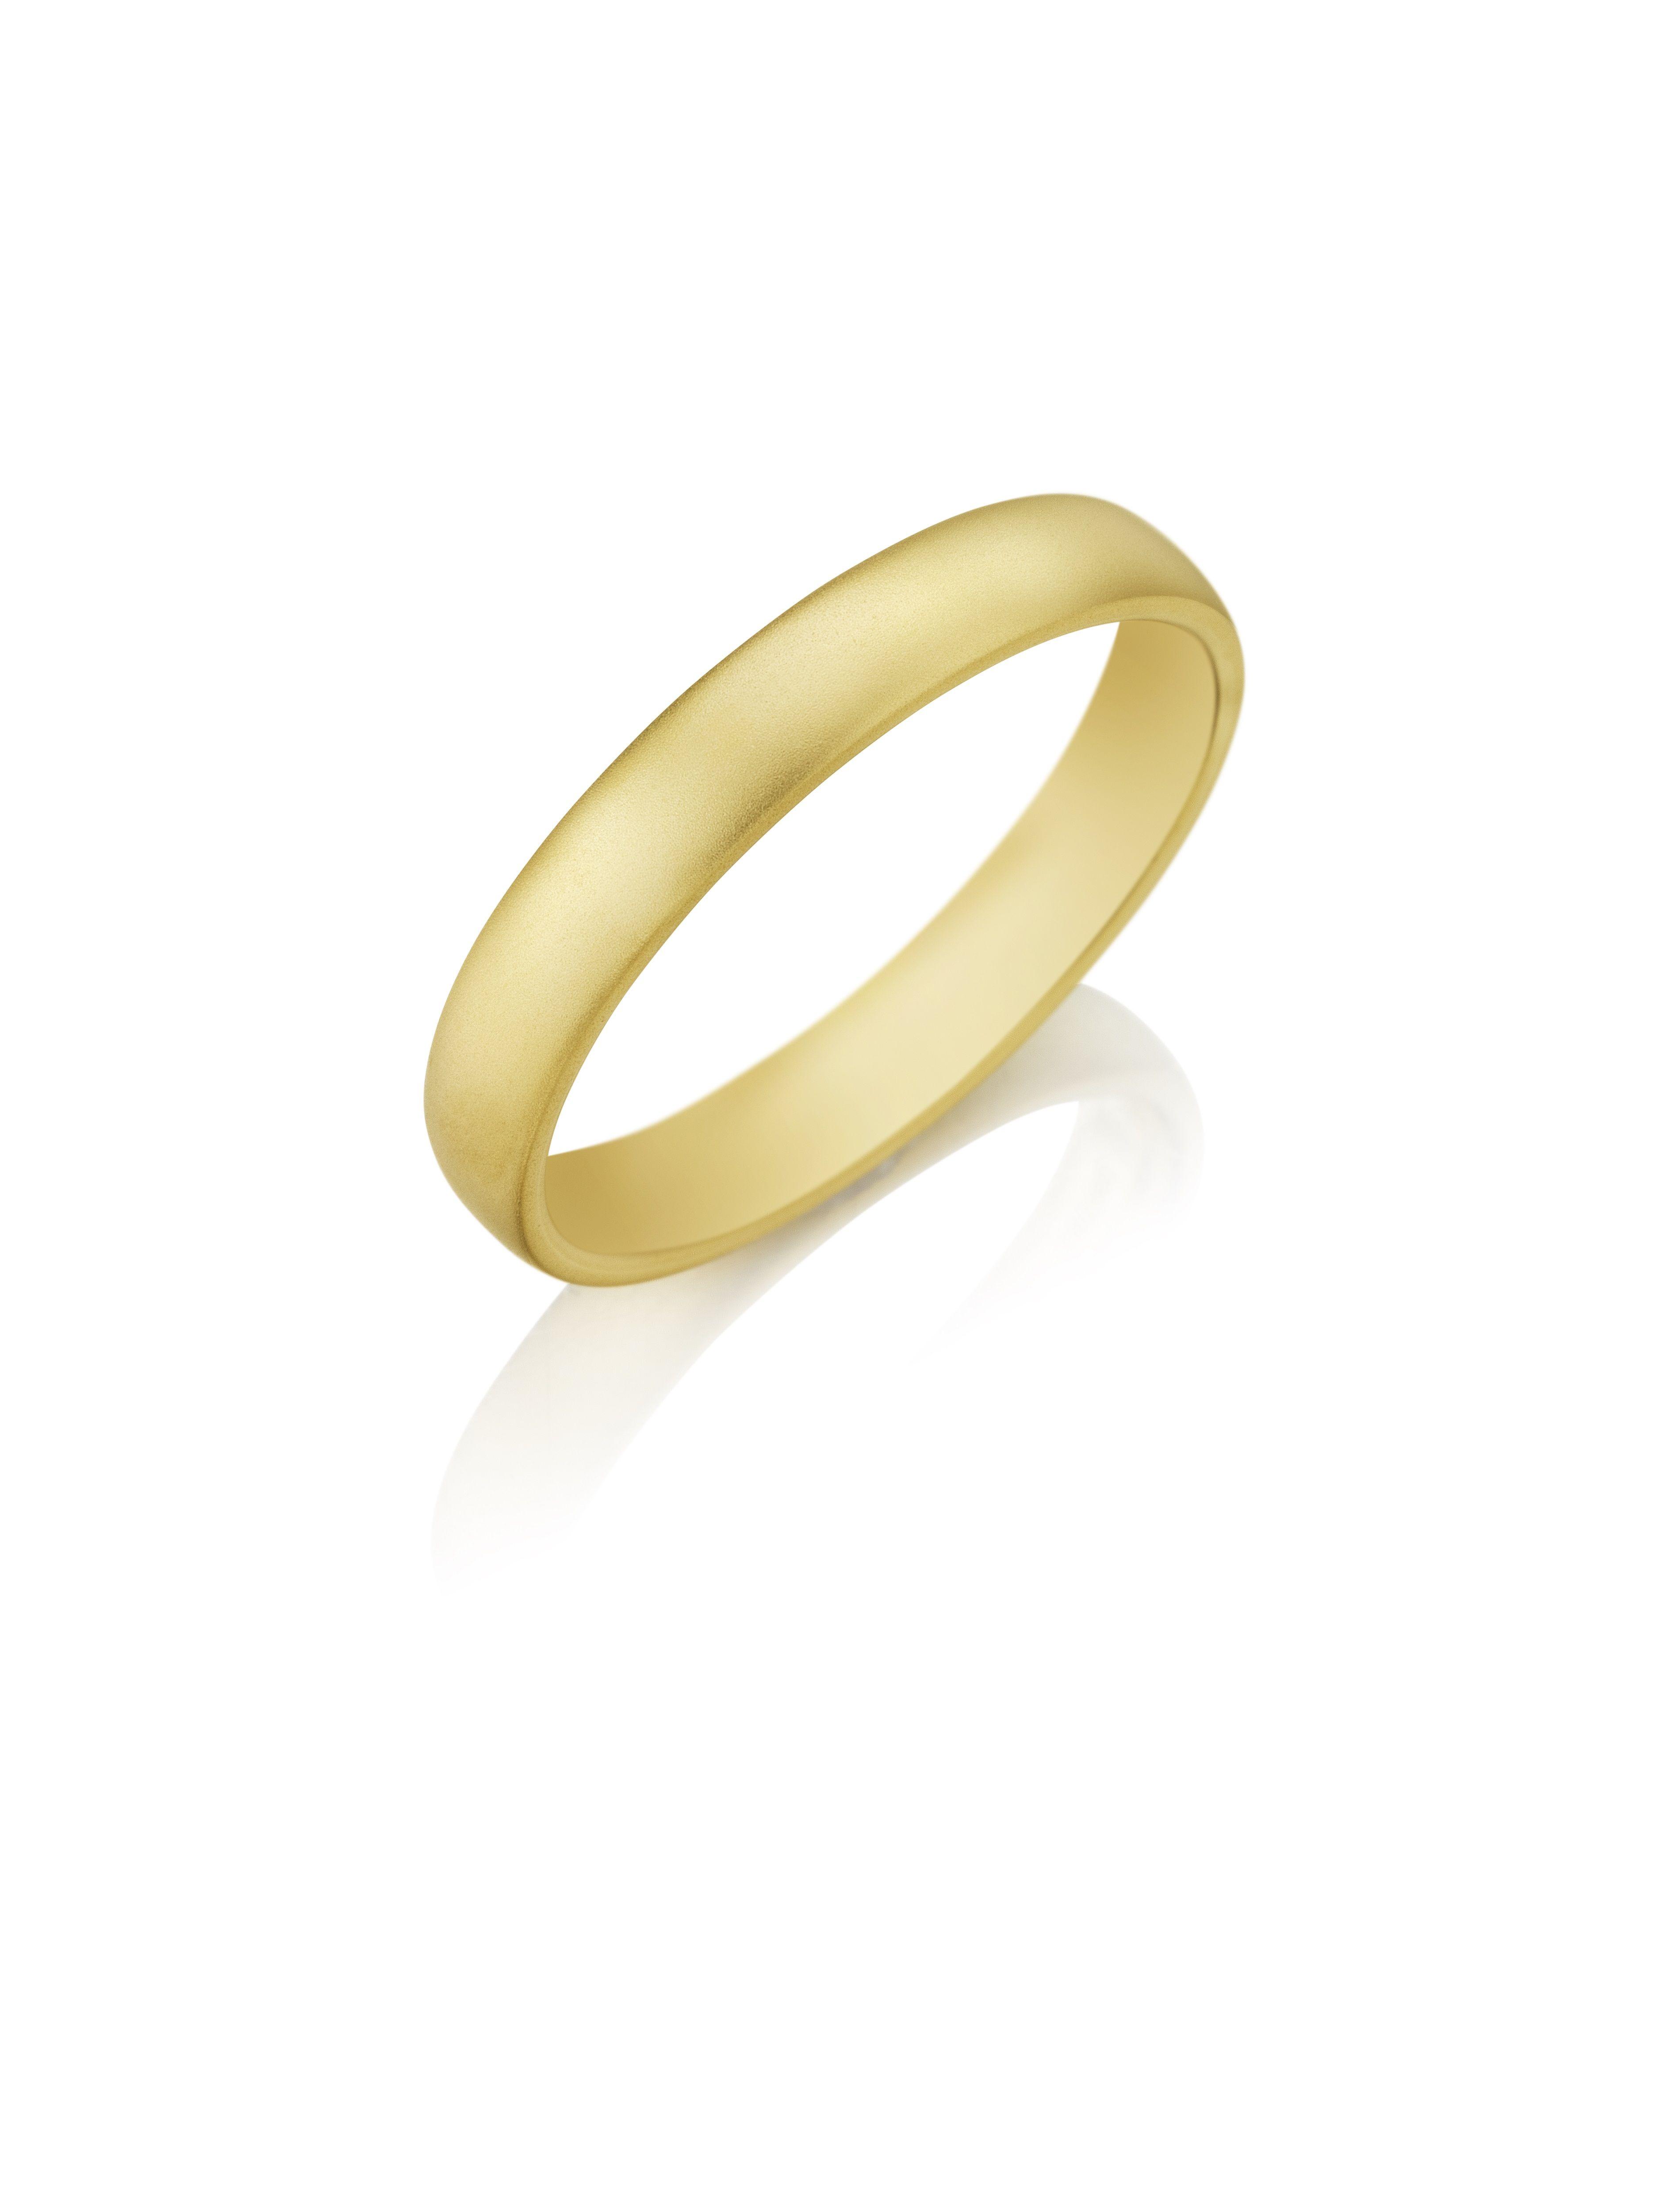 Style MB62 |  #HenriDaussi #wedding #ring #band #weddingband #mensweddingband #yellowgold #luxury #mensfashion #jewelry